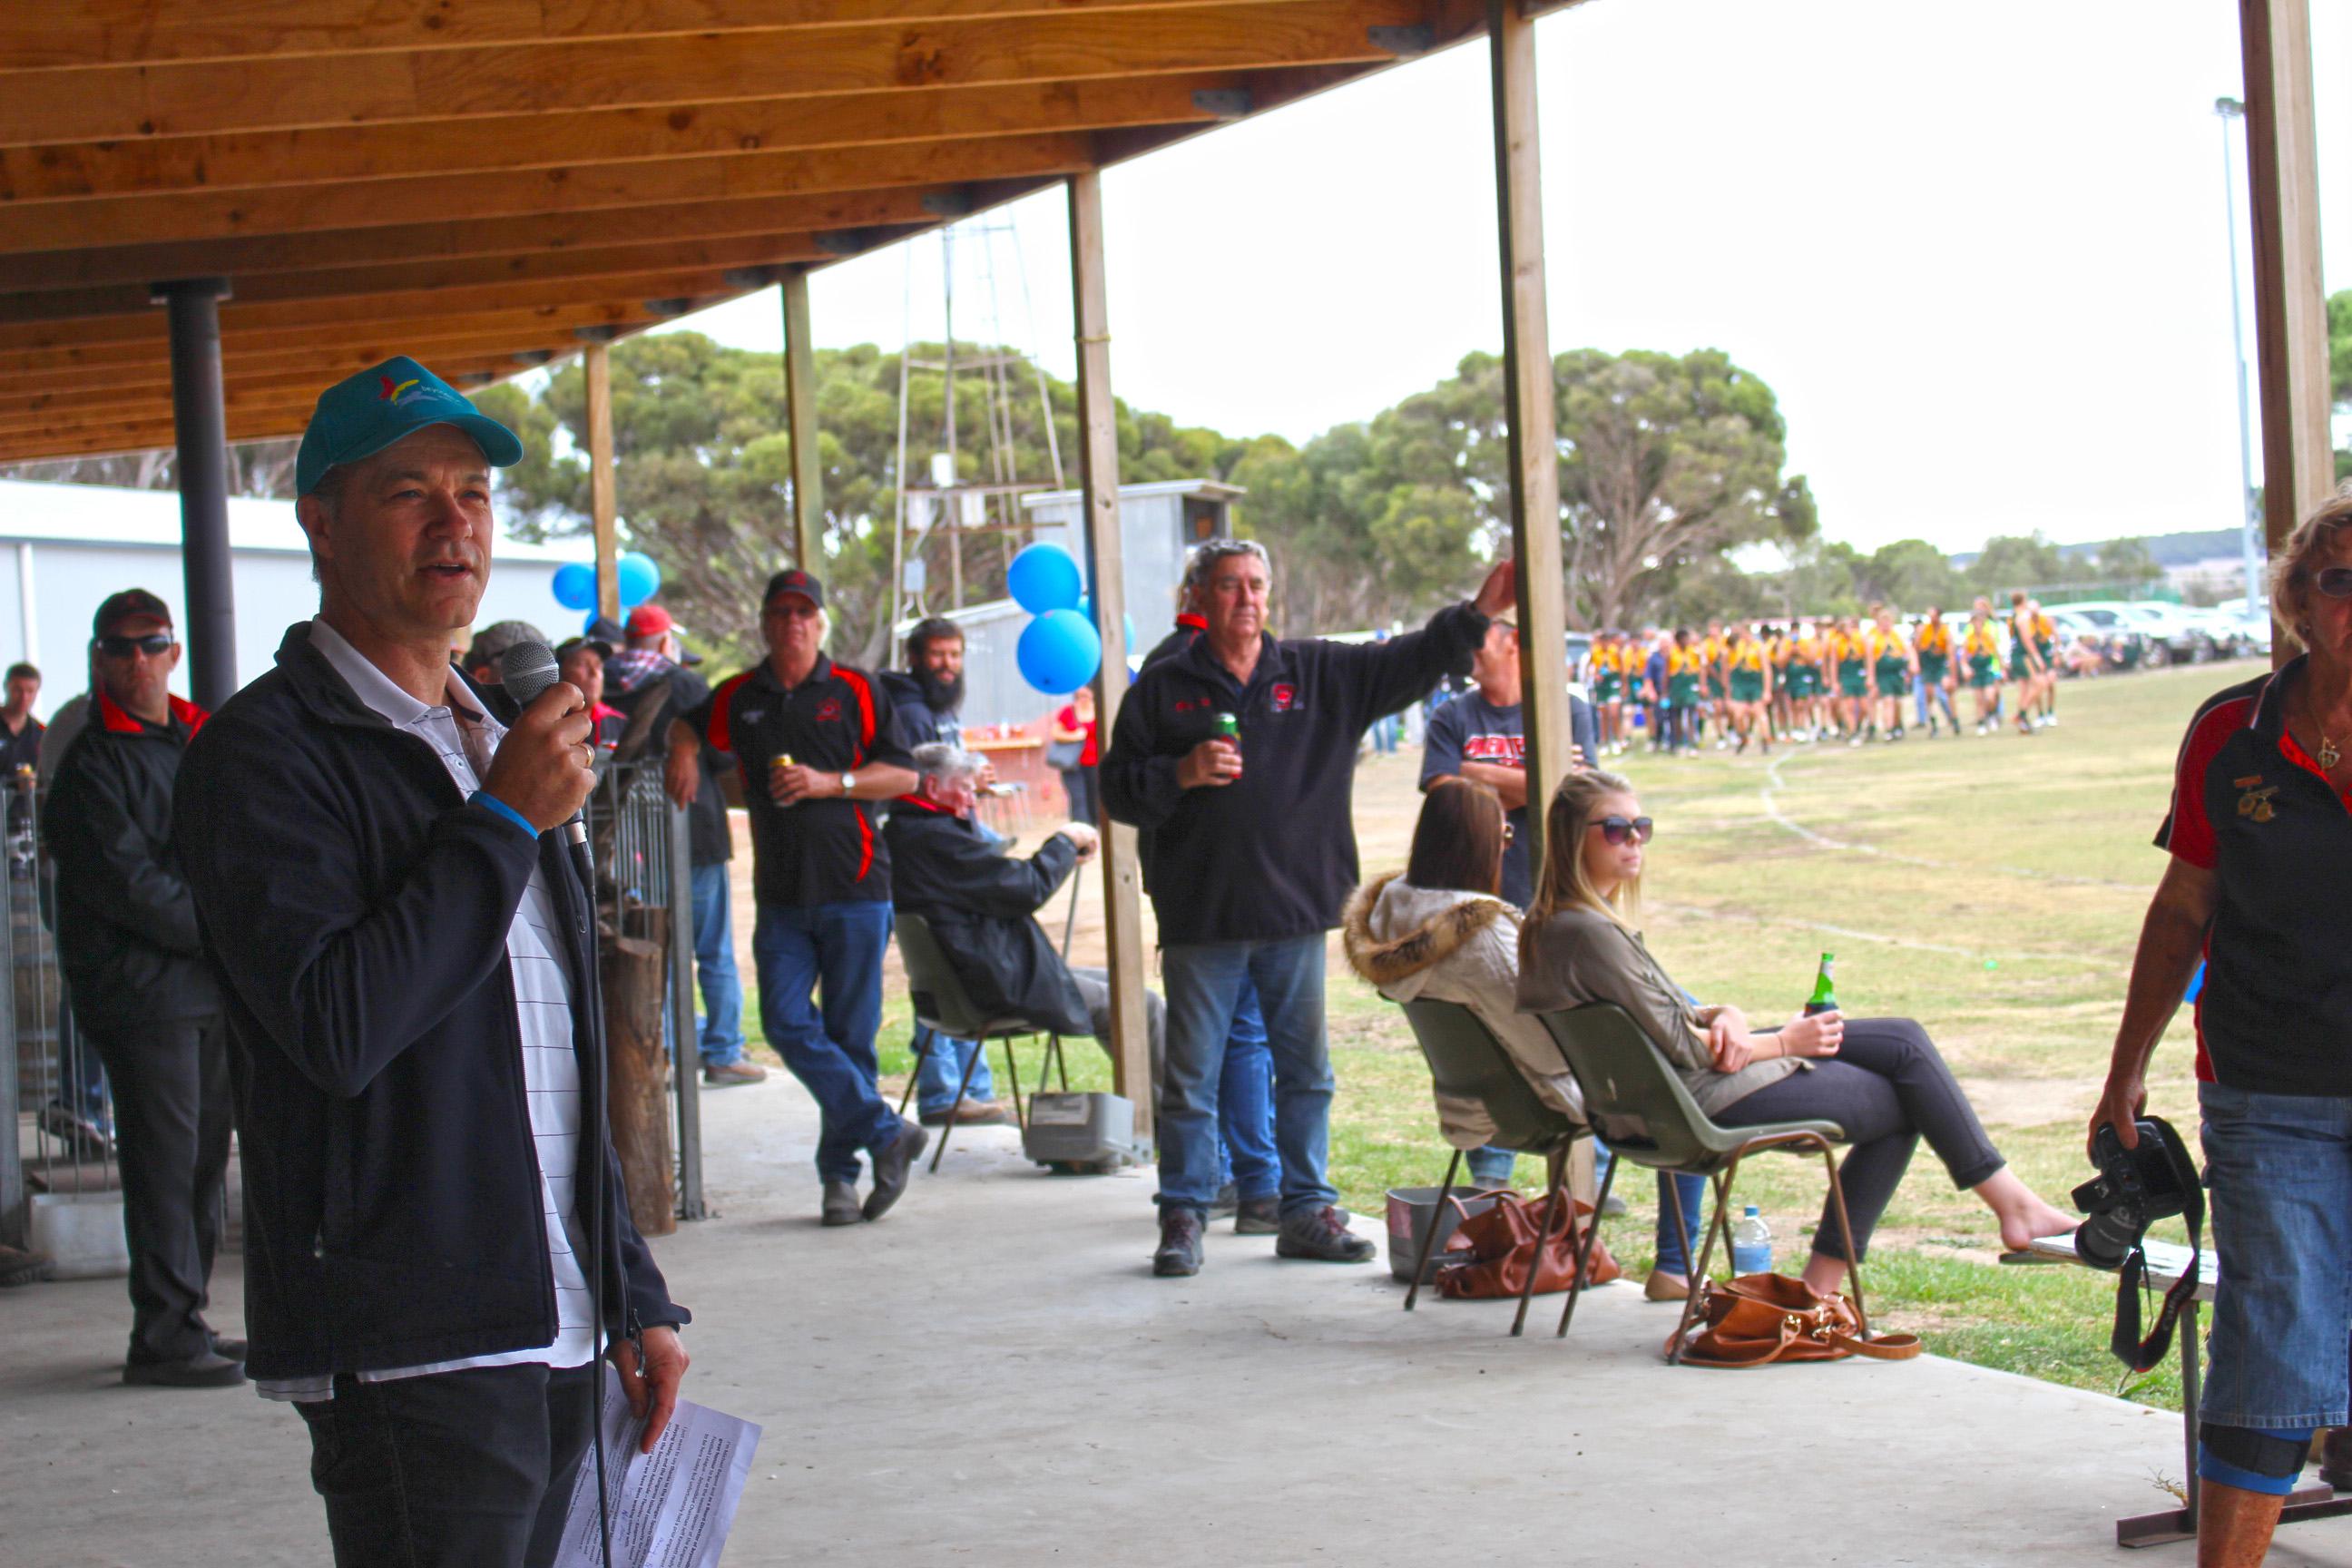 Beyond Blue Board Director Associate Professor Michael Baigent addresses the crowd at Kangaroo Island.